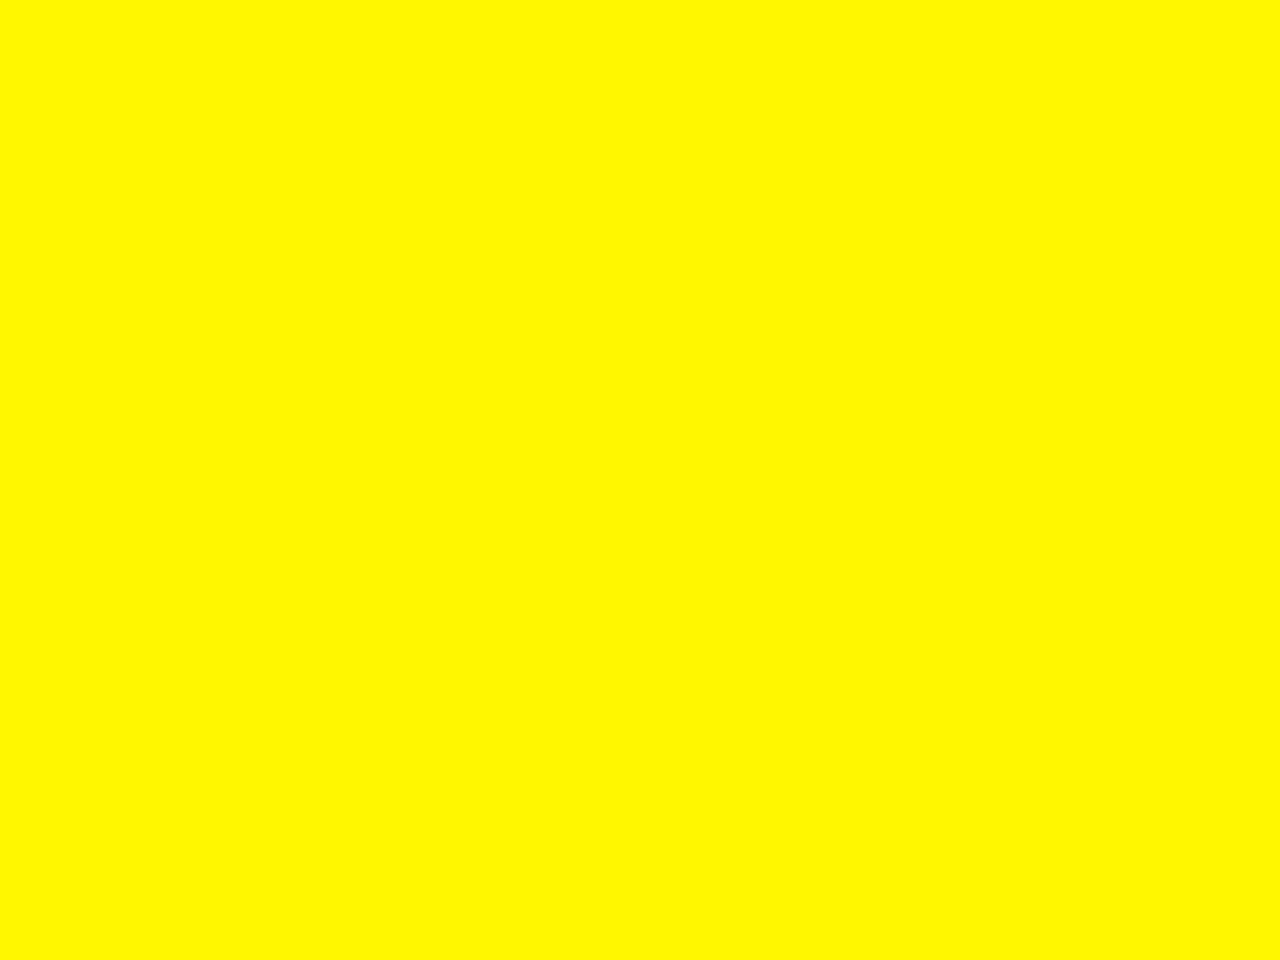 1280x960 Lemon Solid Color Background